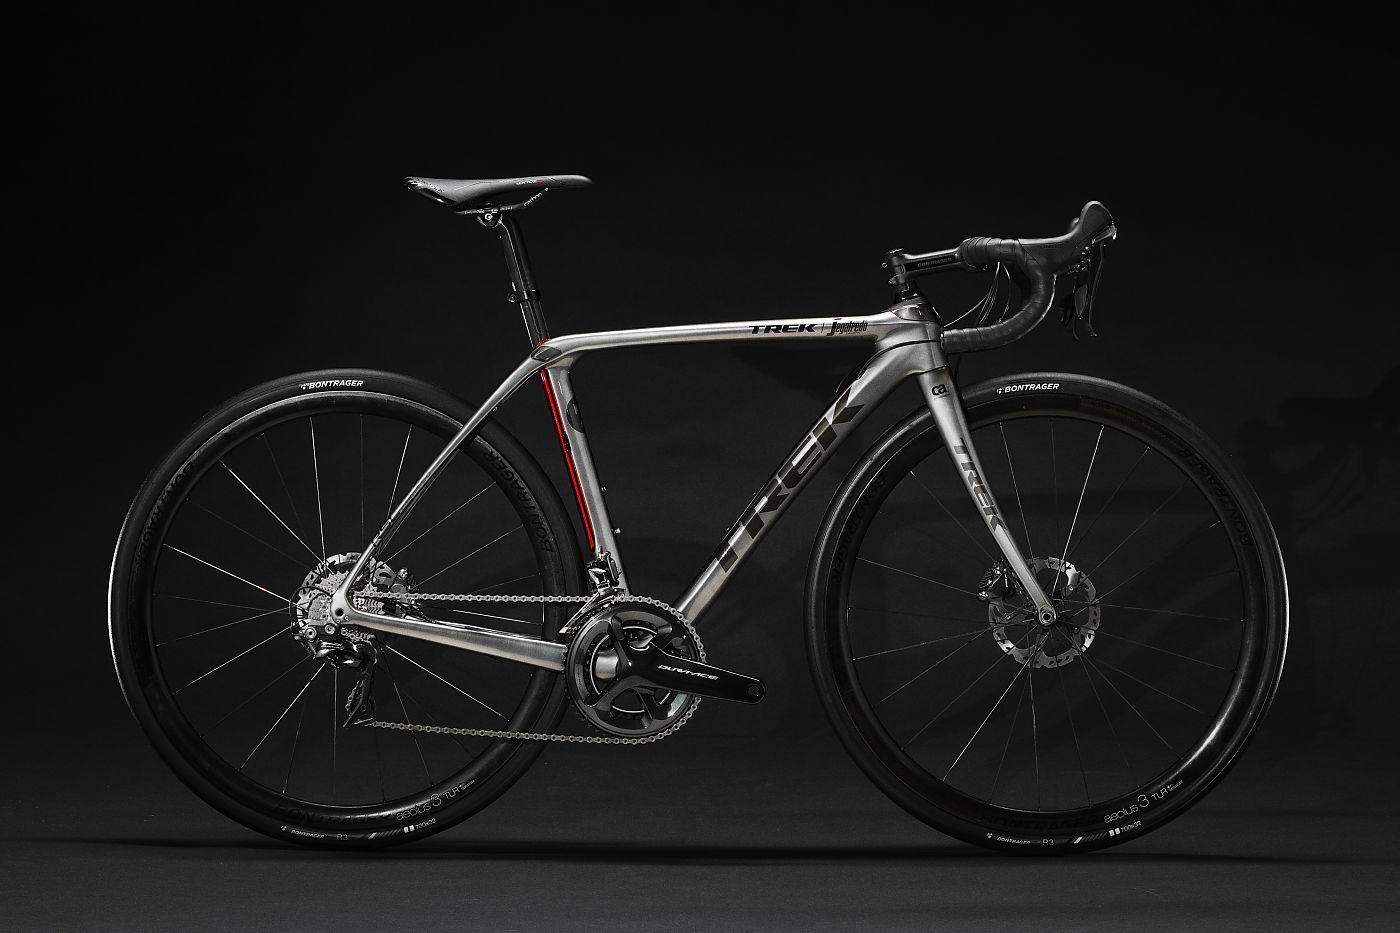 Trek Releases New Domane Slr With Pro Endurance Geometry